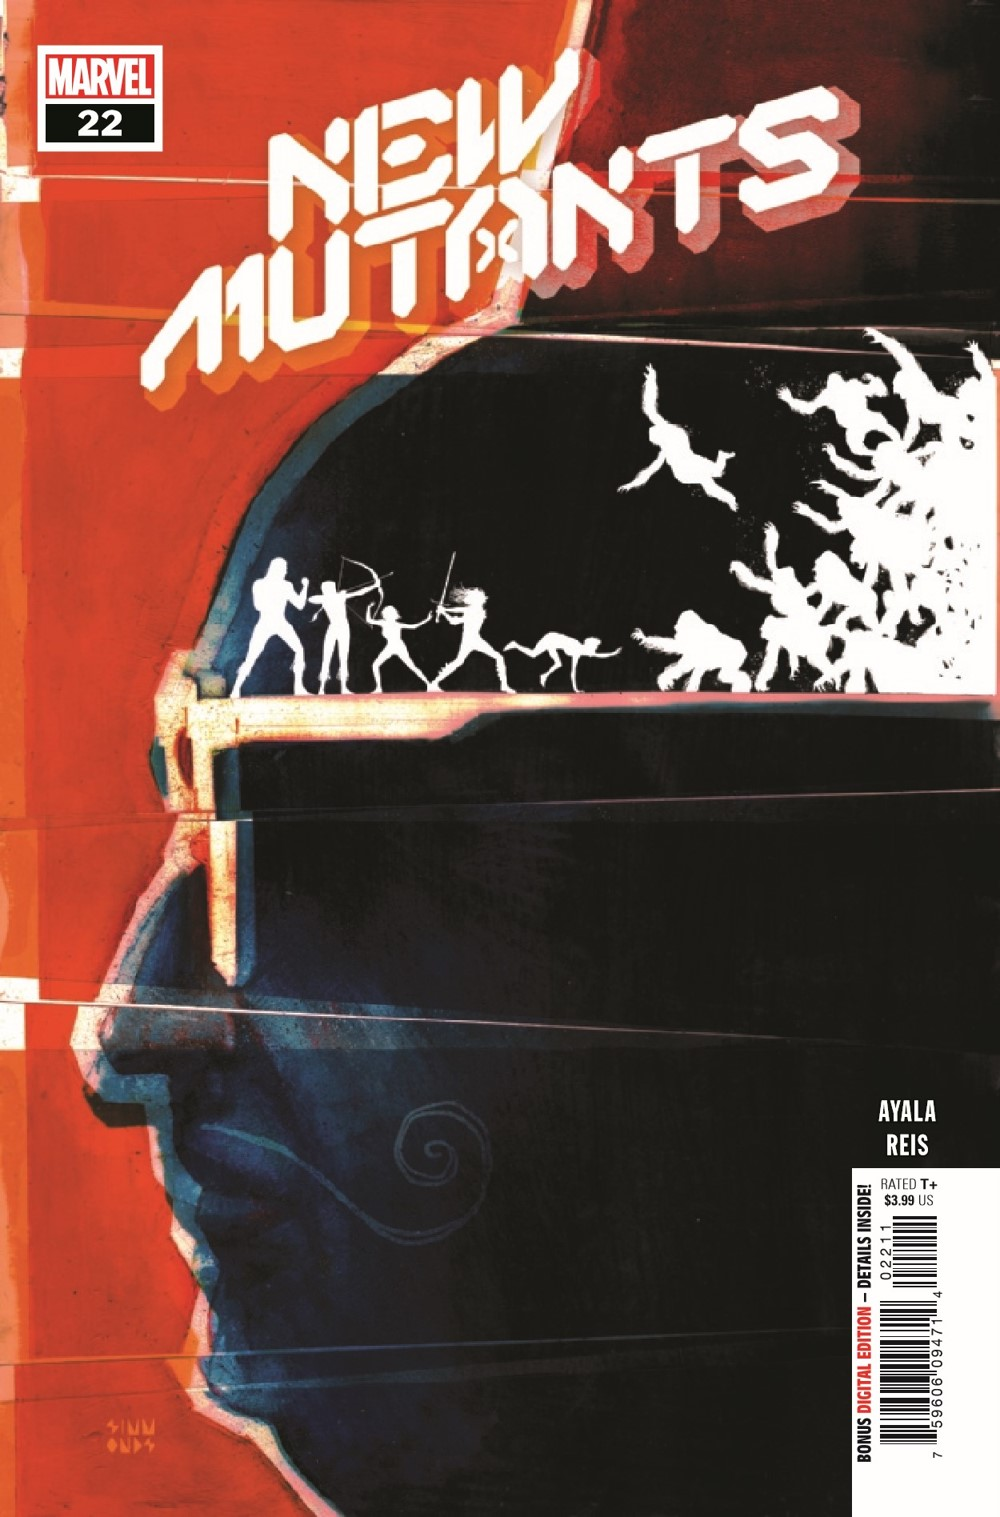 NEWMUT2019022_Preview-1 ComicList Previews: NEW MUTANTS #22